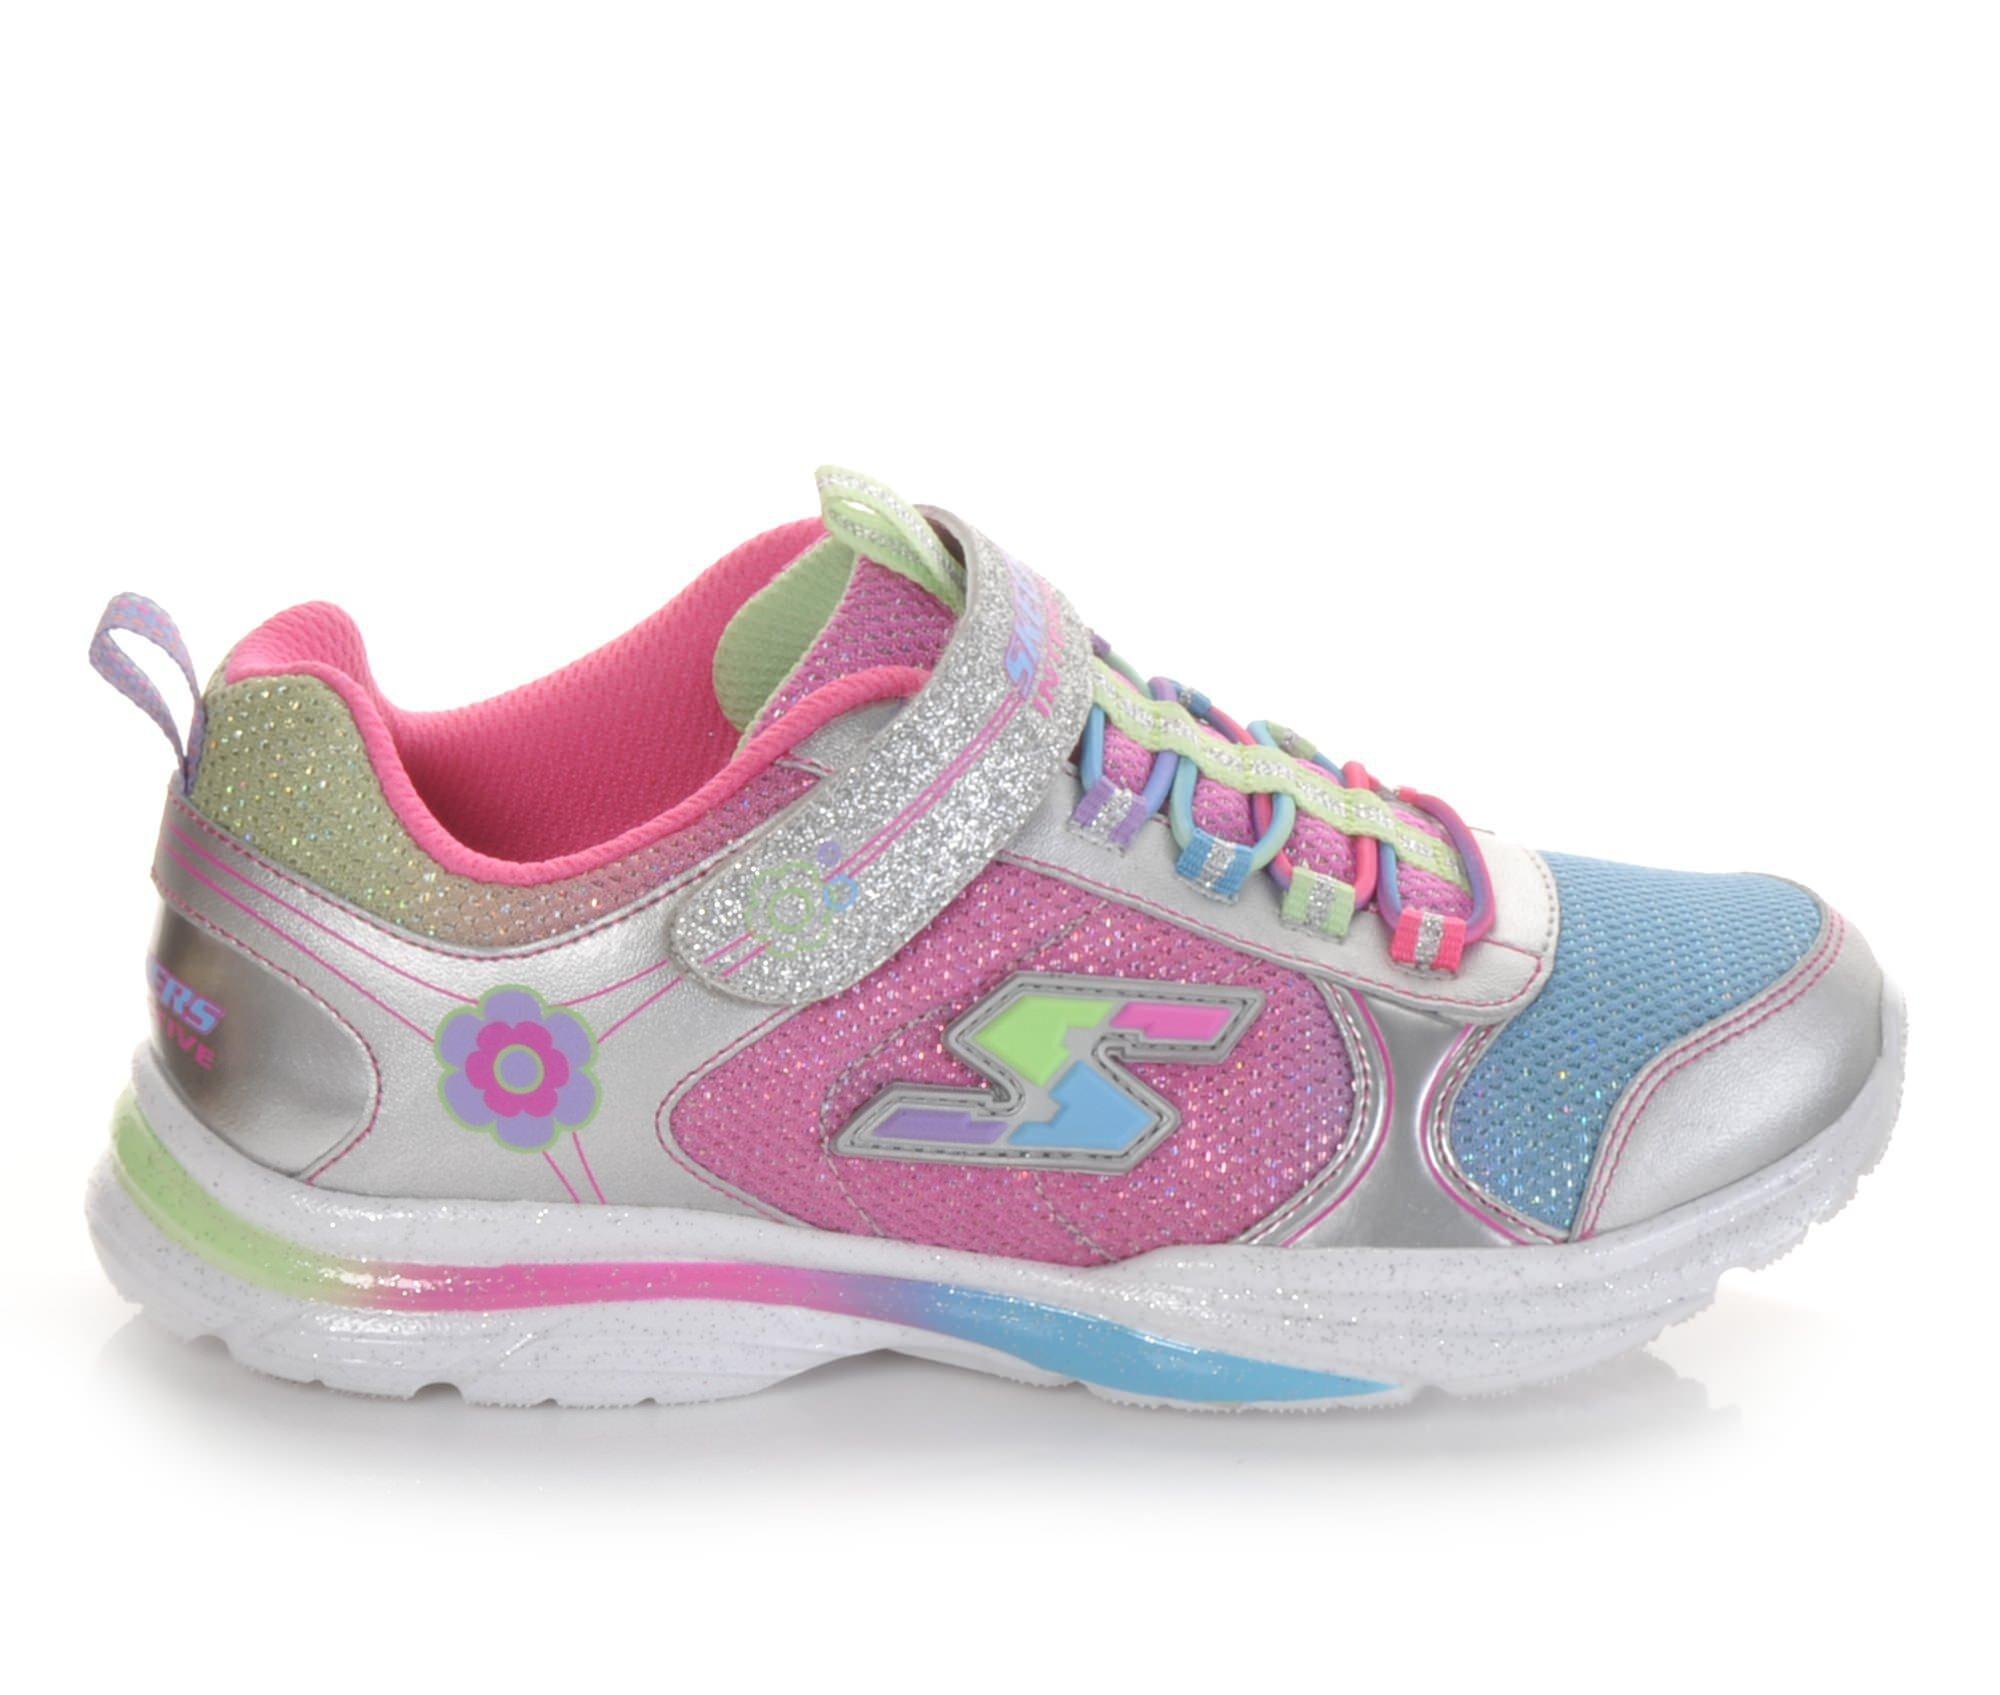 Skechers Shoes Skechers Game Kicks 10 5 4 Girls Sports Shoes Silver/Multi